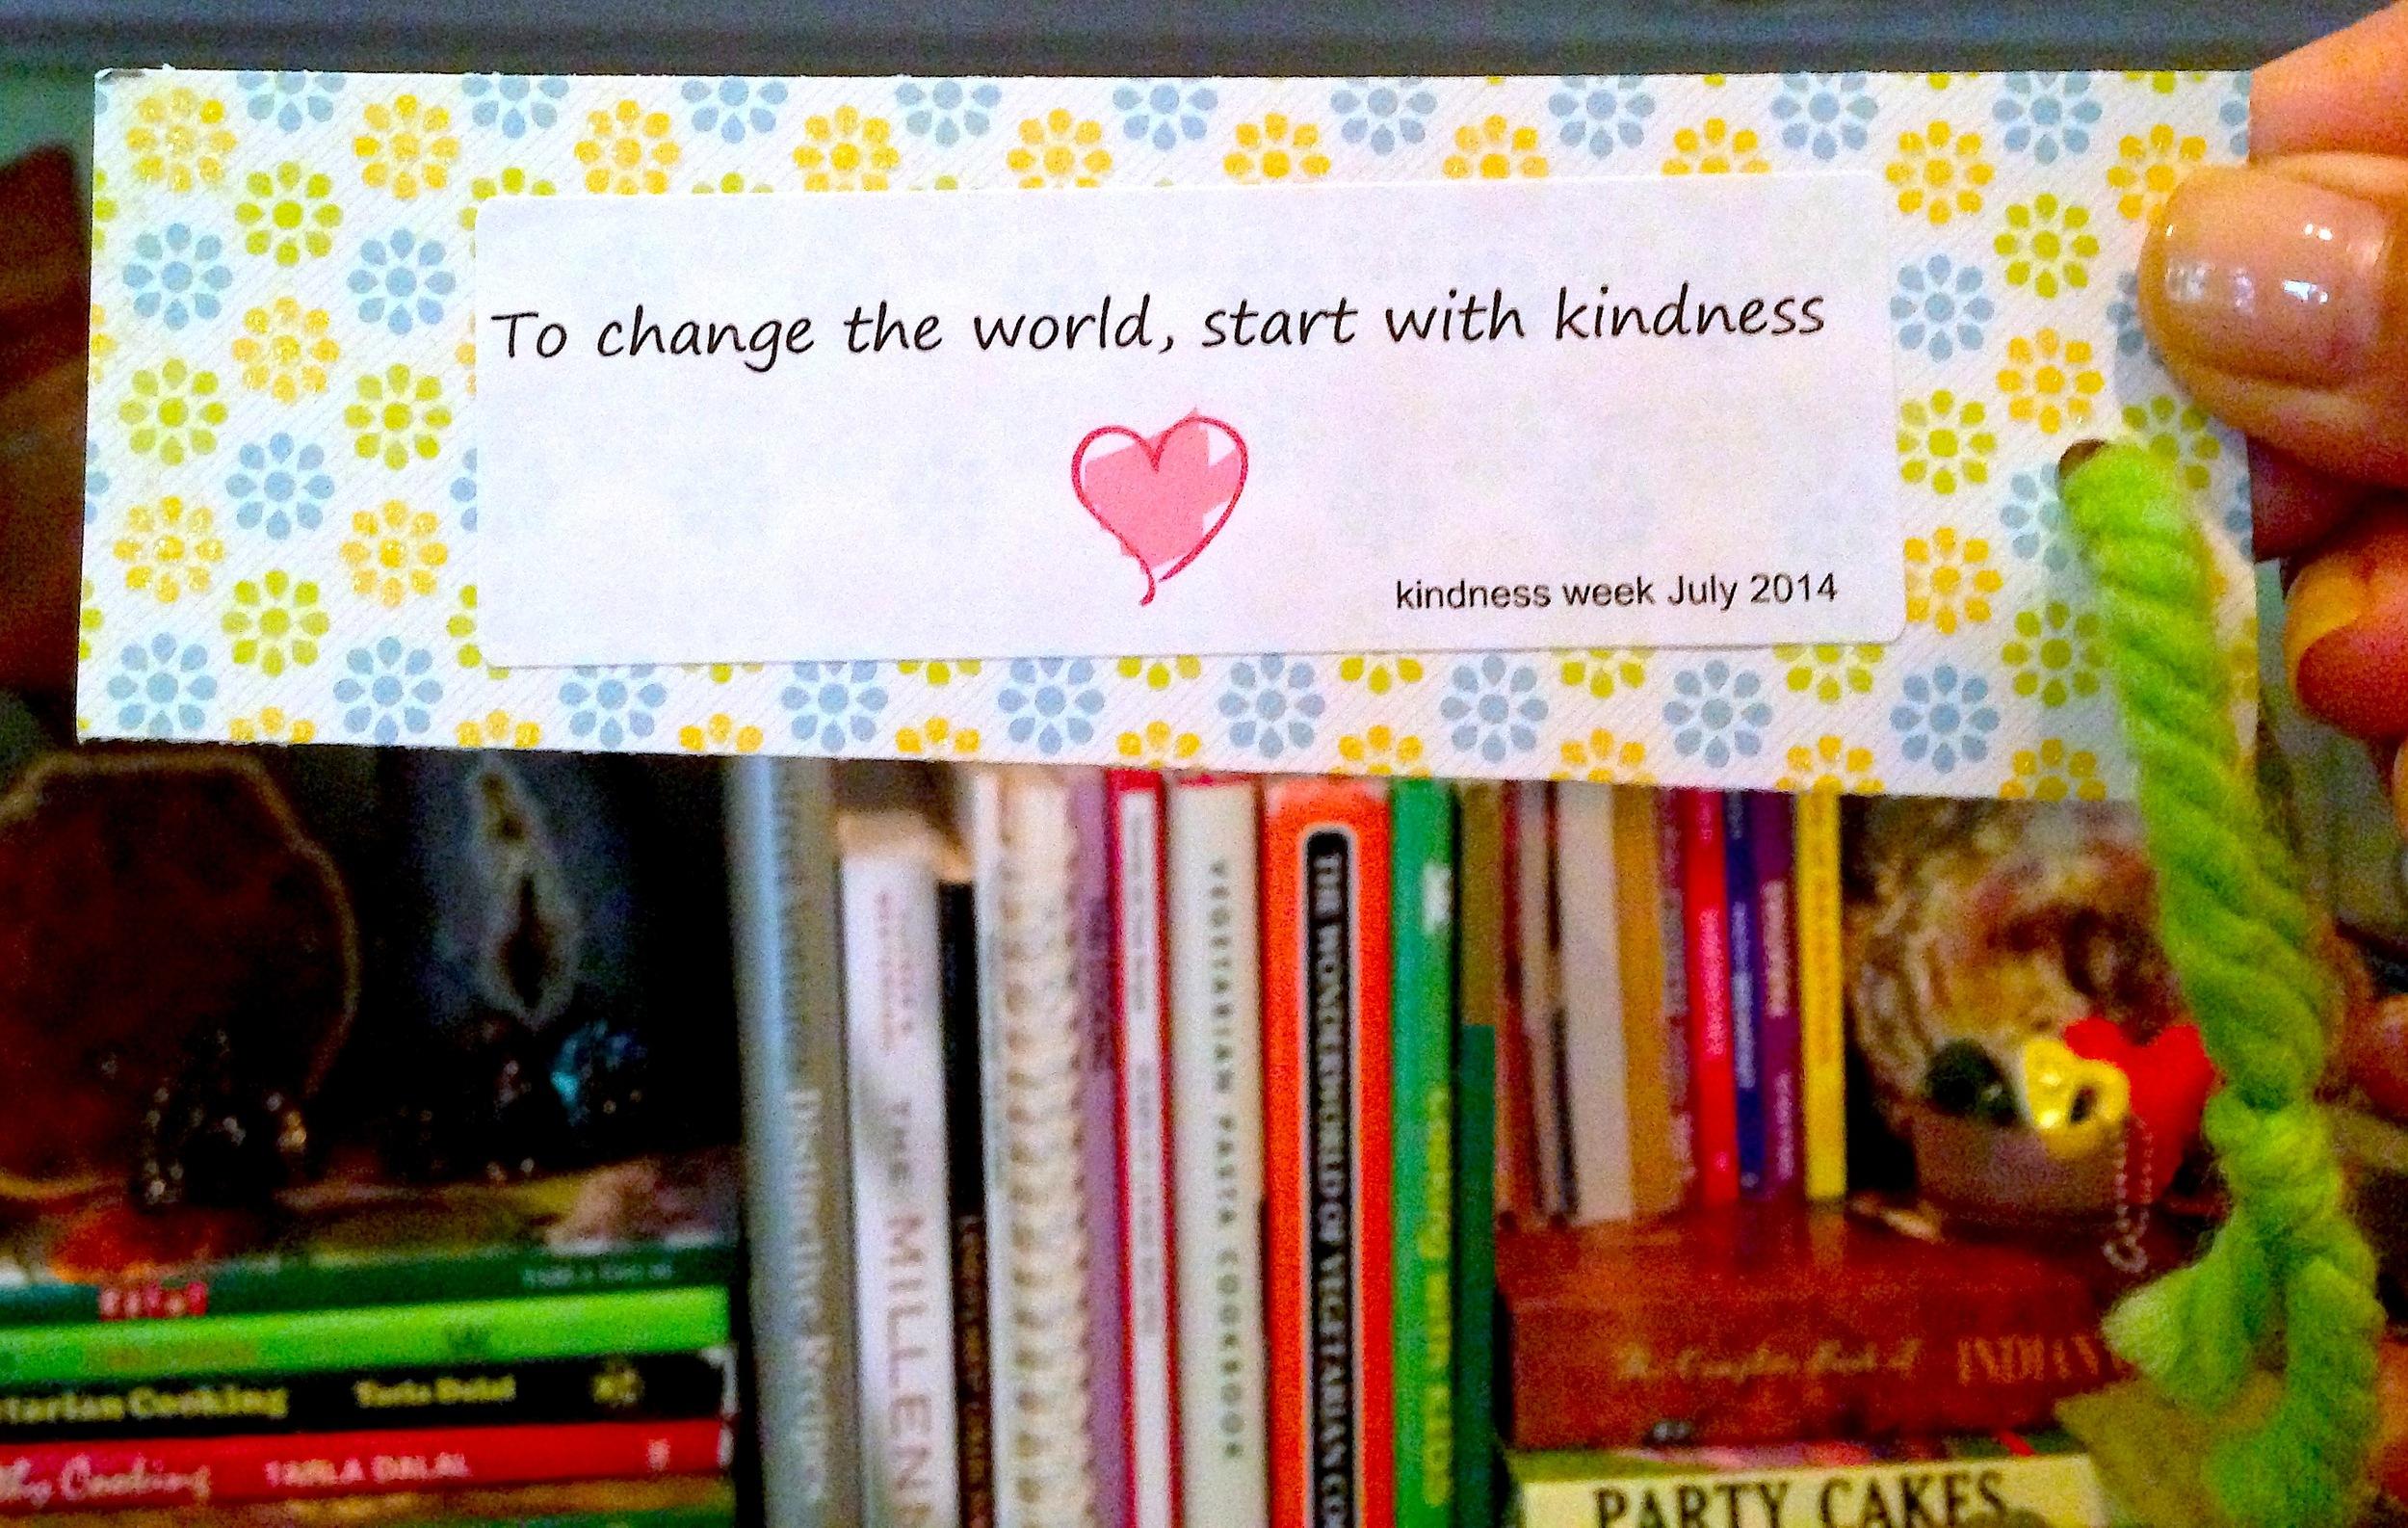 EH_Bridgepoint_KindnessBookmark.JPG